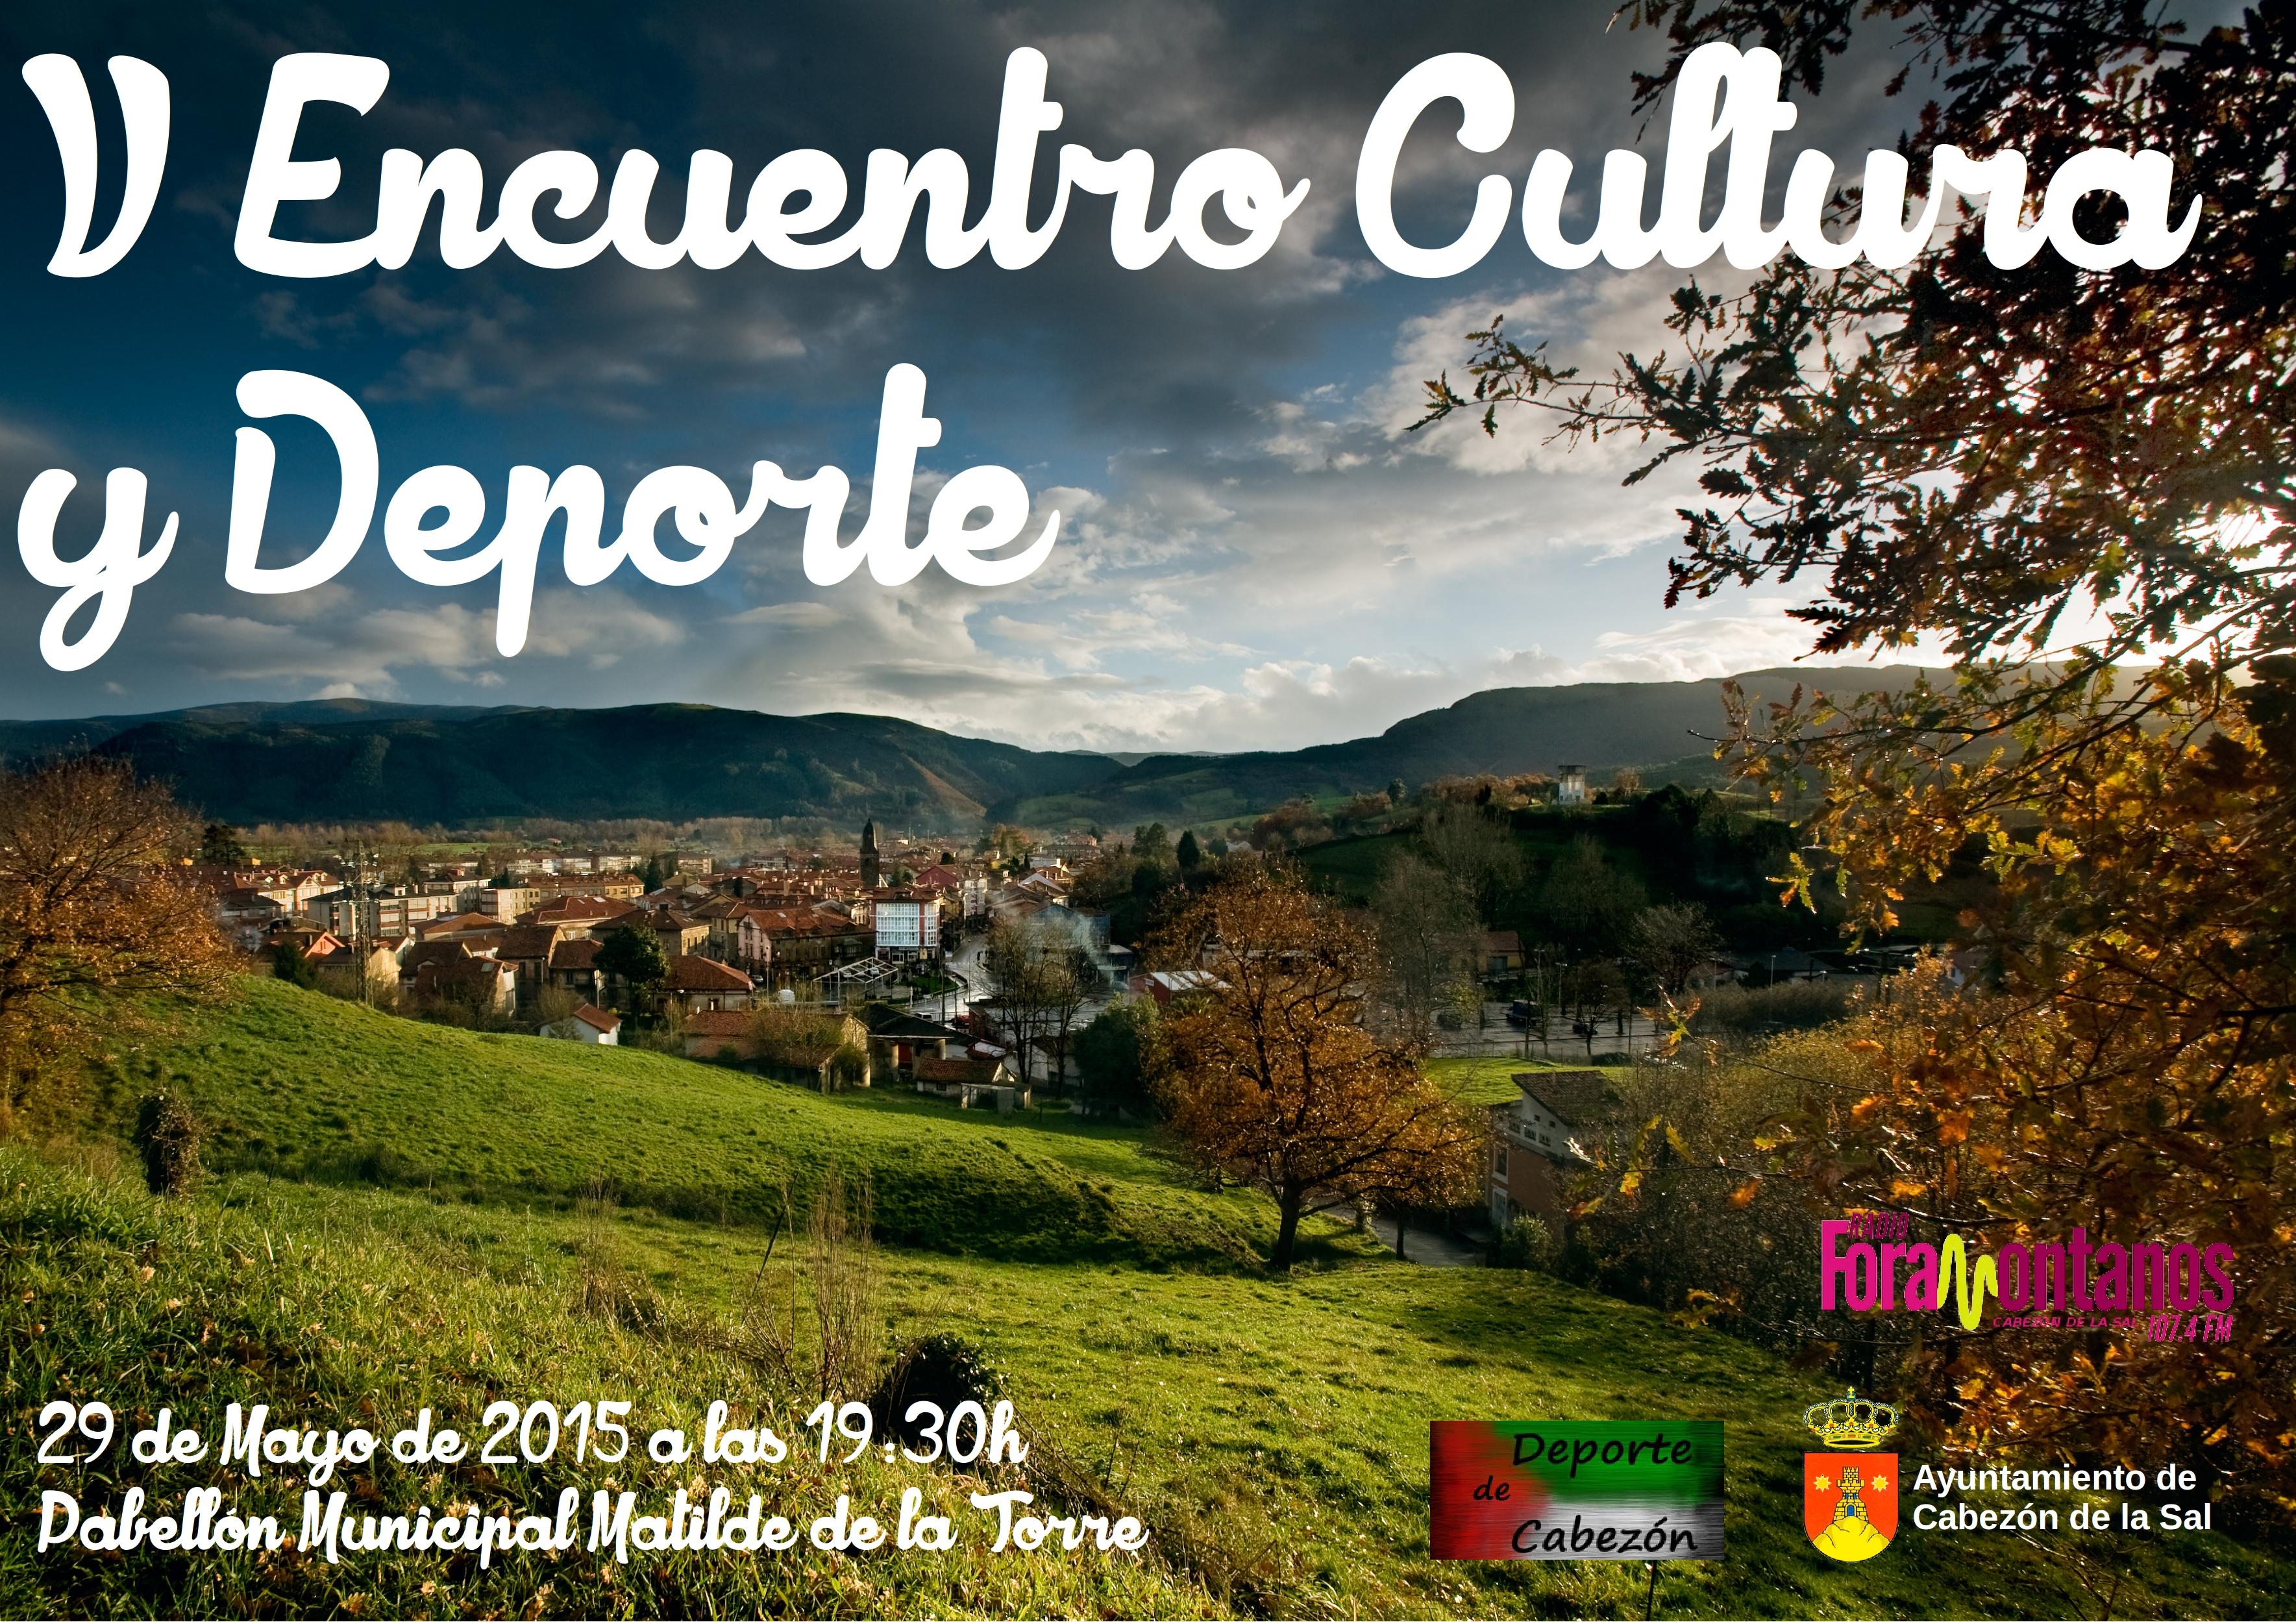 http://www.cabezondelasal.net/wp-content/uploads/2015/05/Cartel-Gala-Deporte-y-Cultura-2015.jpg